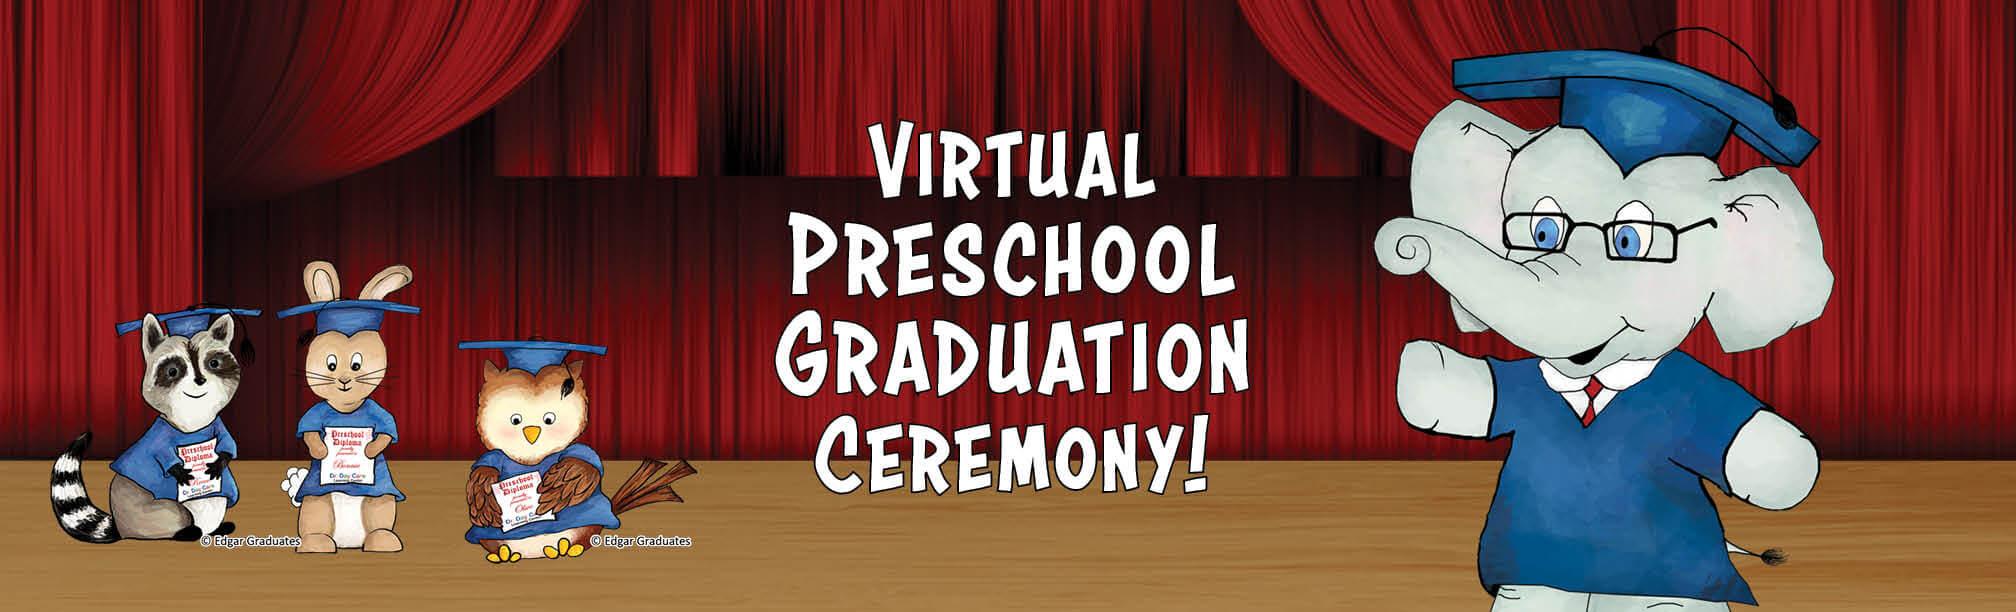 Preschool Graduation Ceremonies – Celebrate with us!